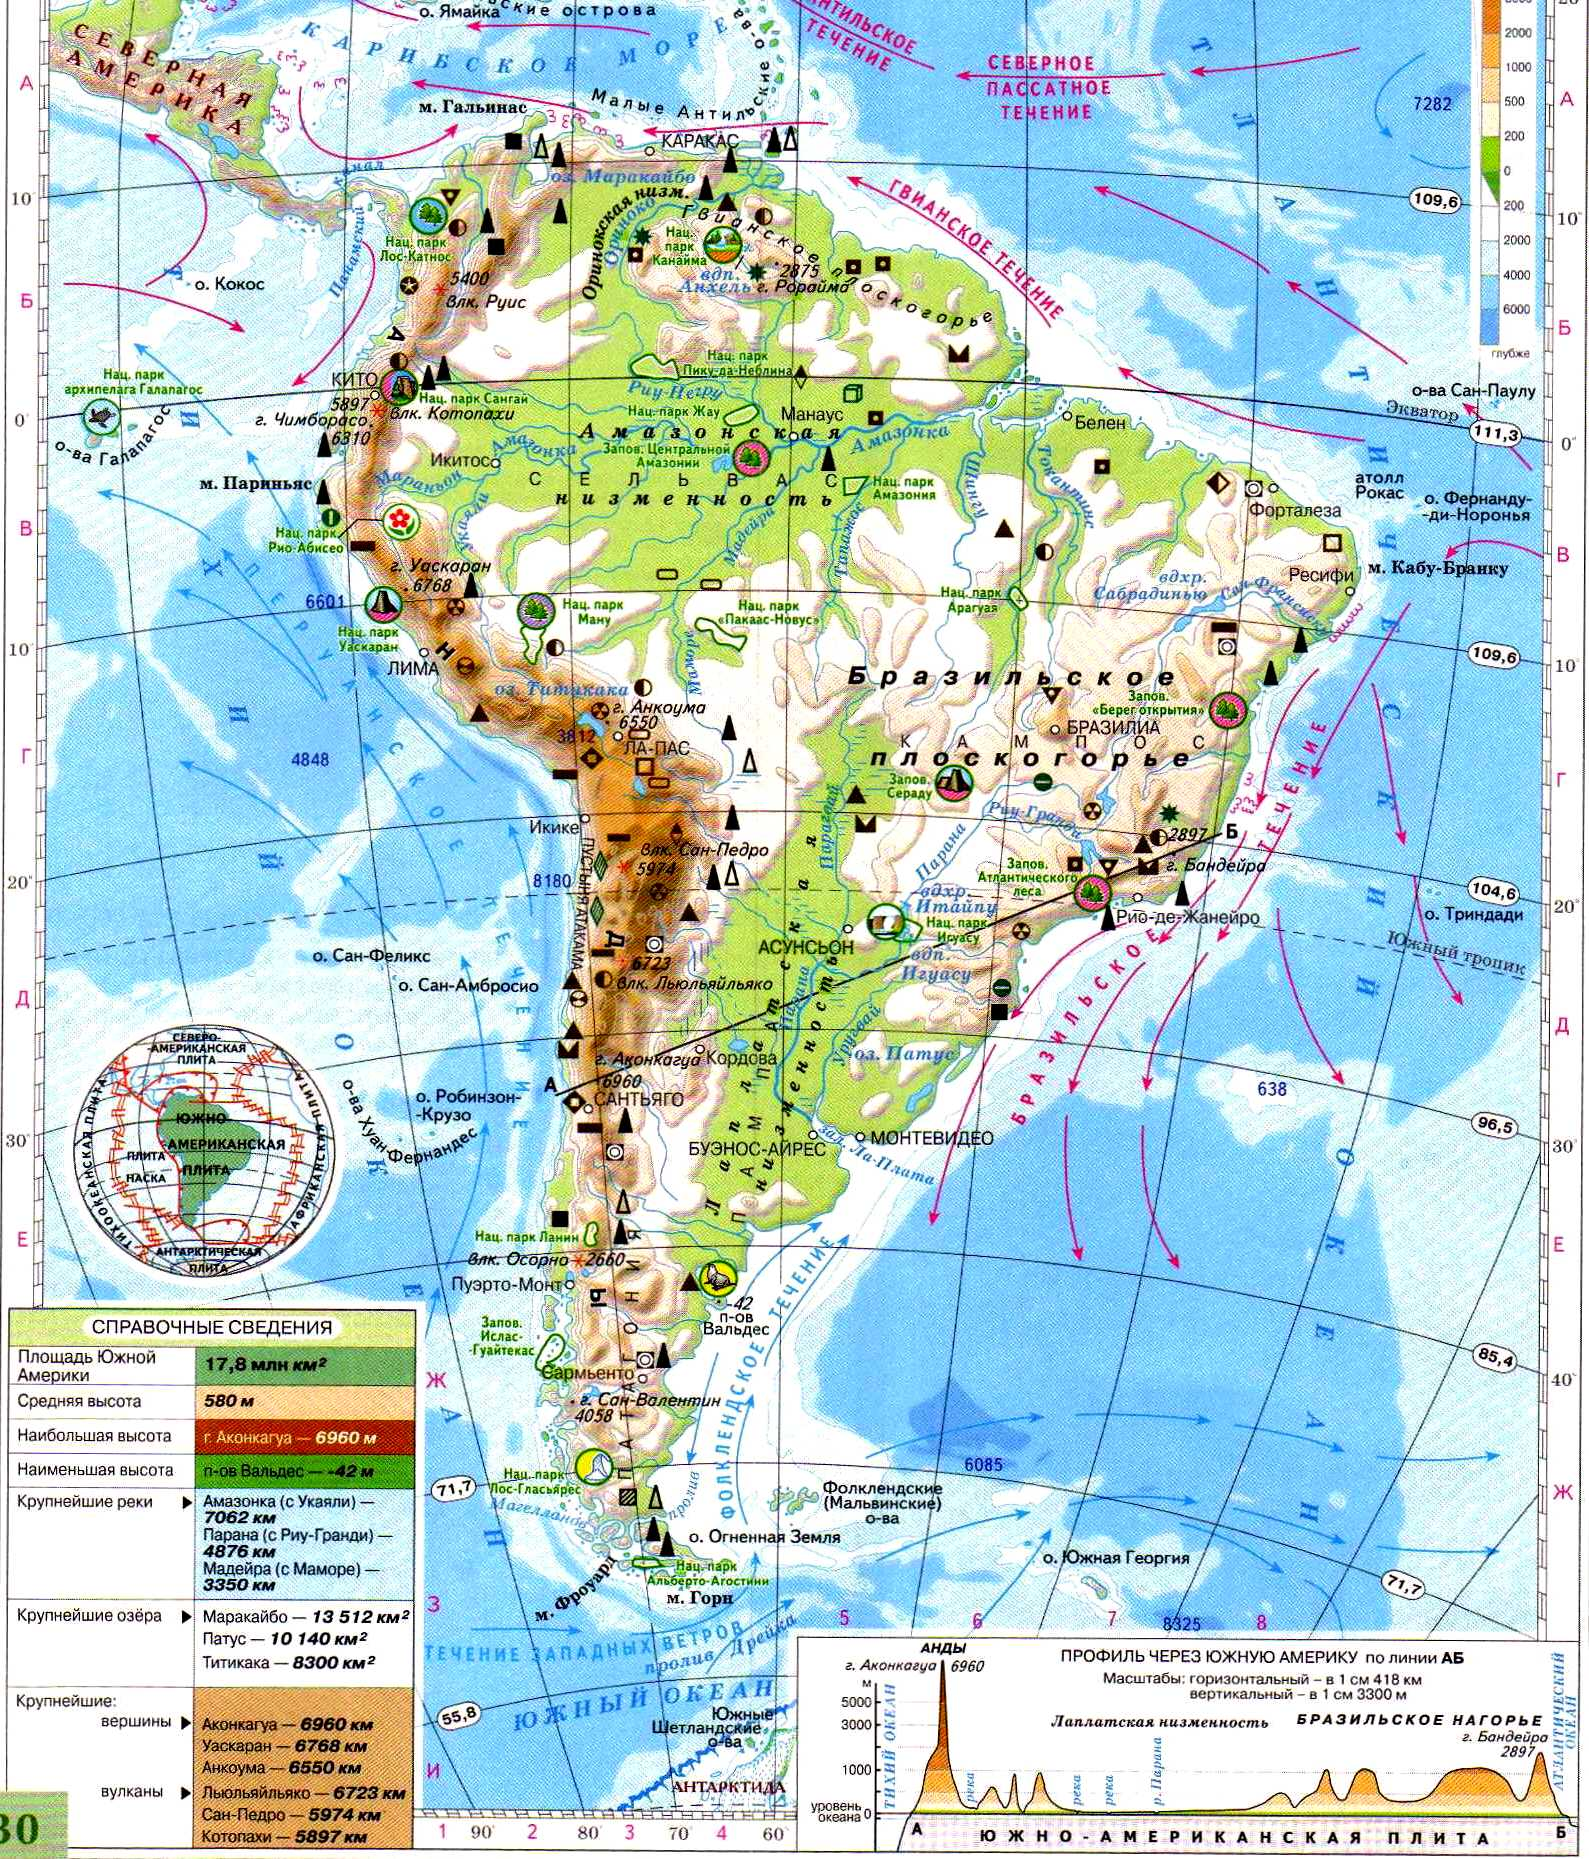 Южная америка краткий доклад 7230